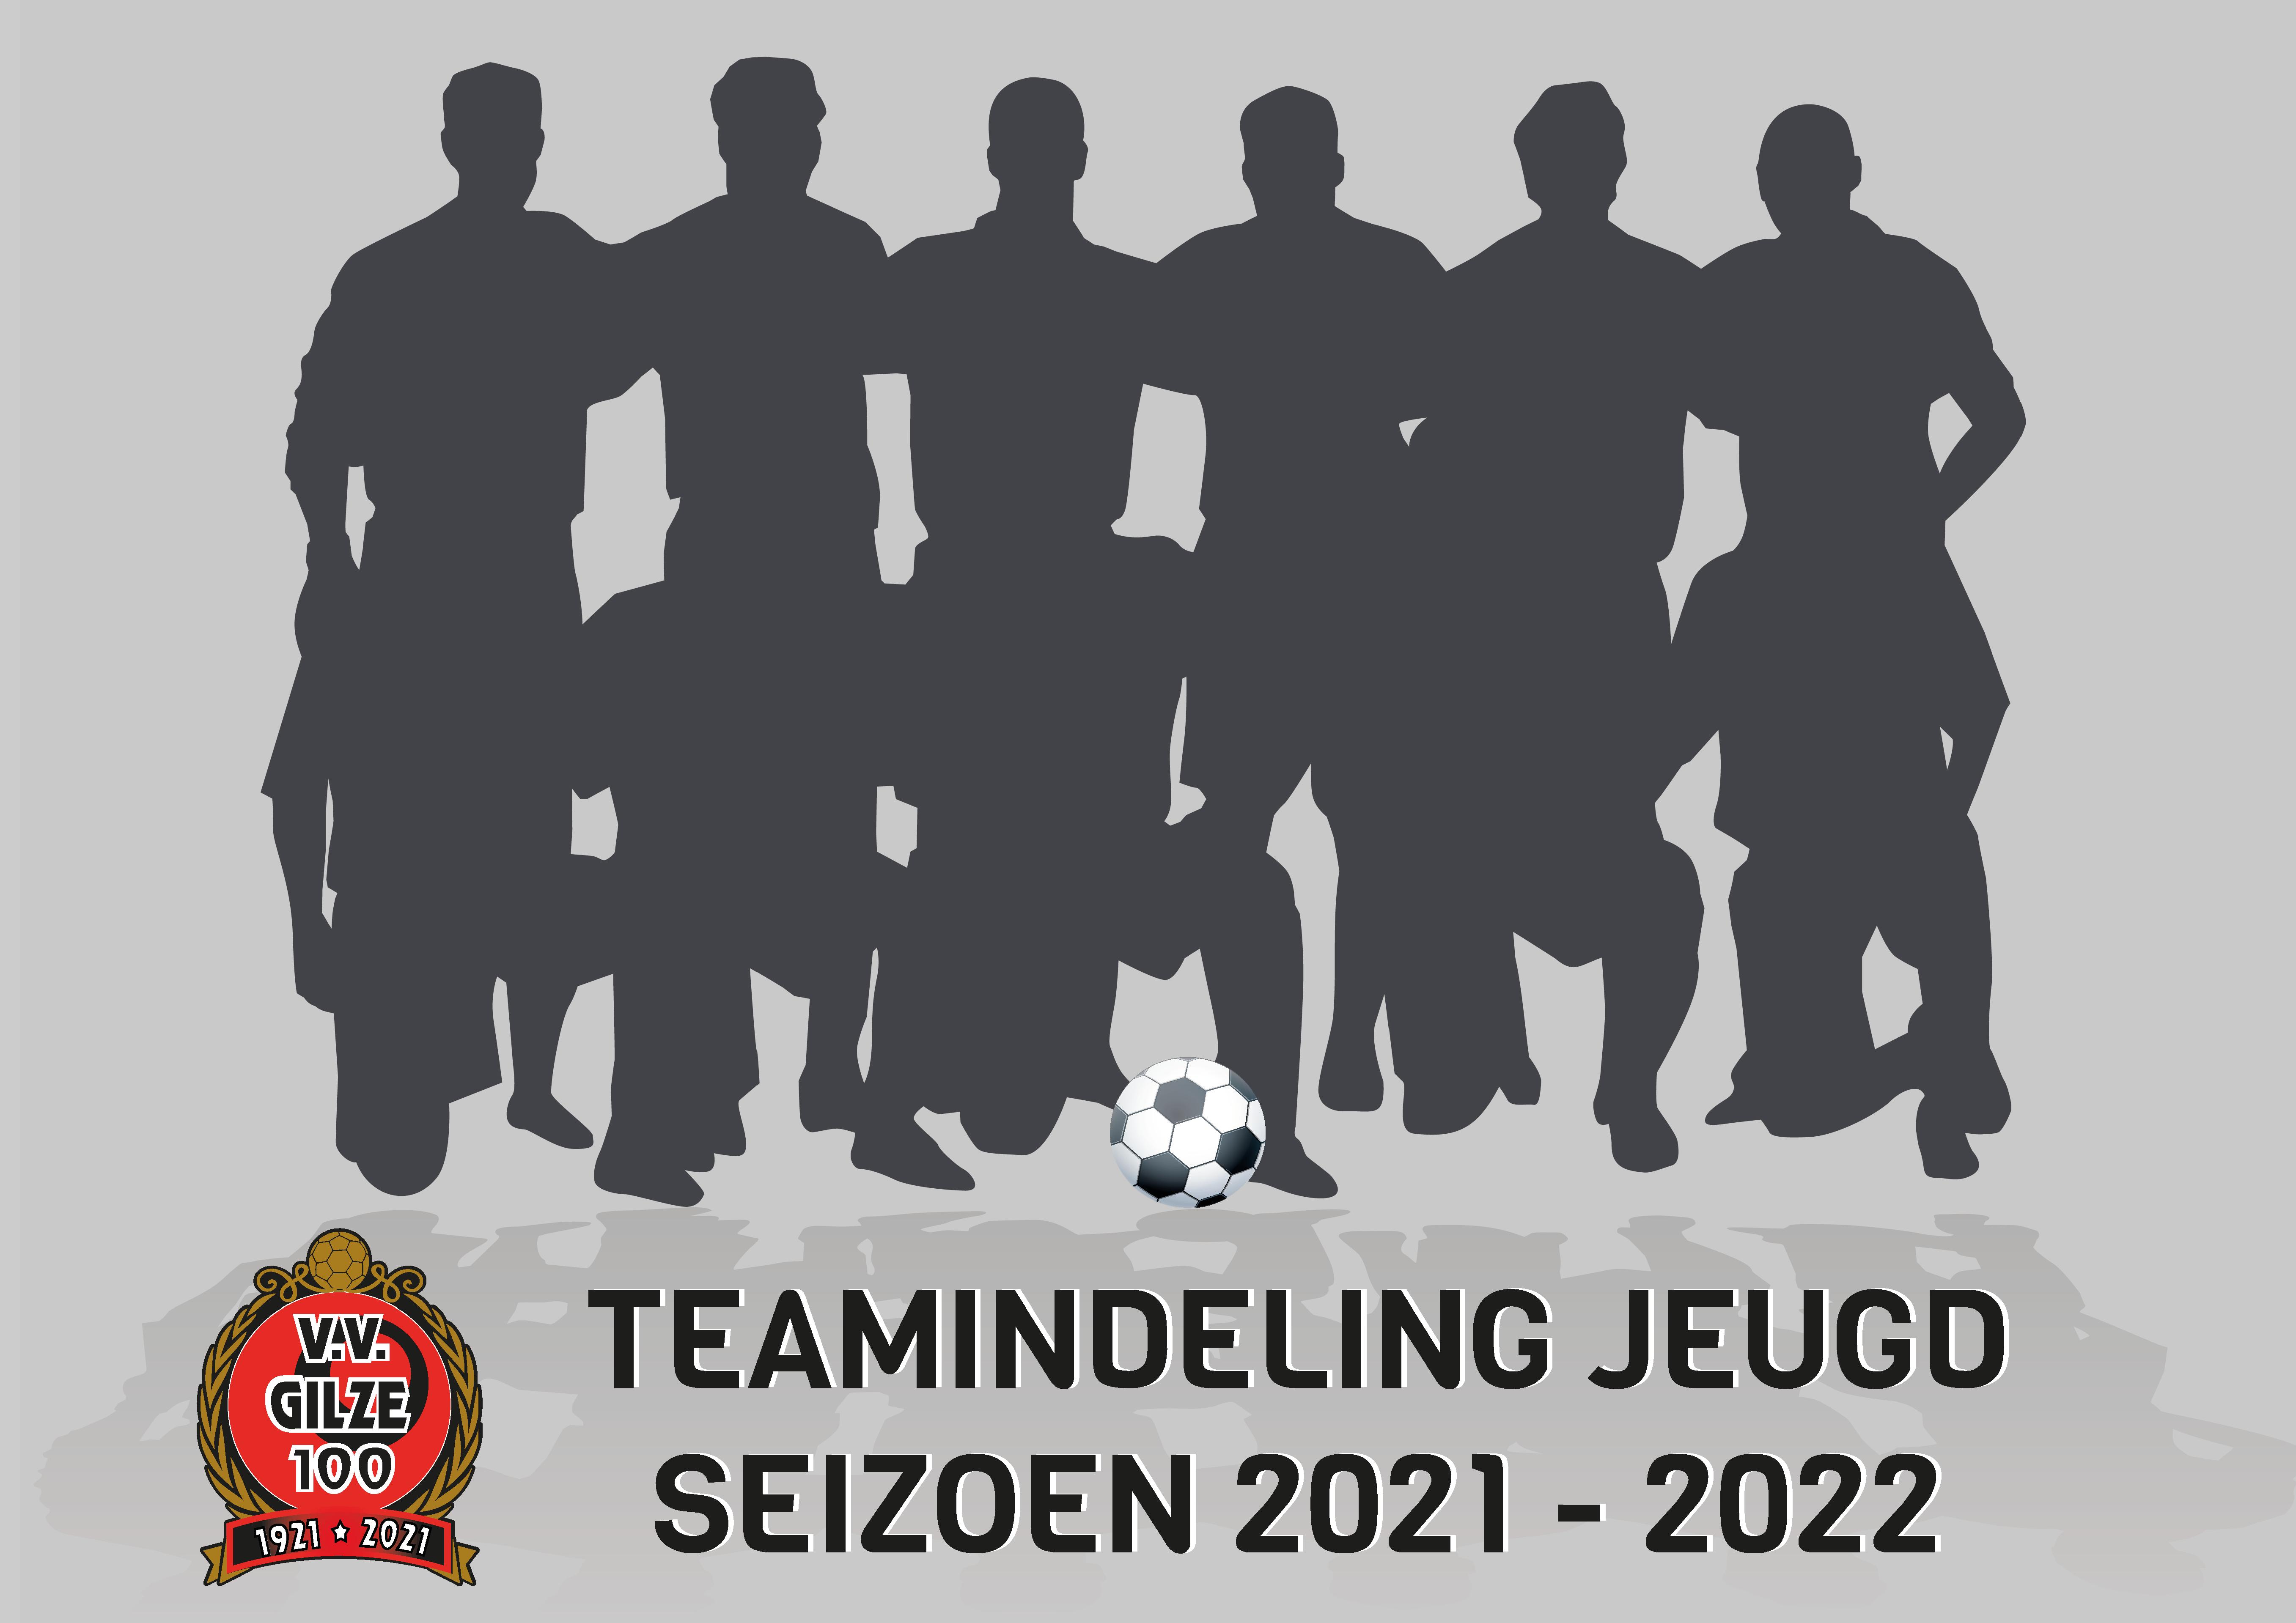 Teamindeling jeugd seizoen 2021/2022 is bekend